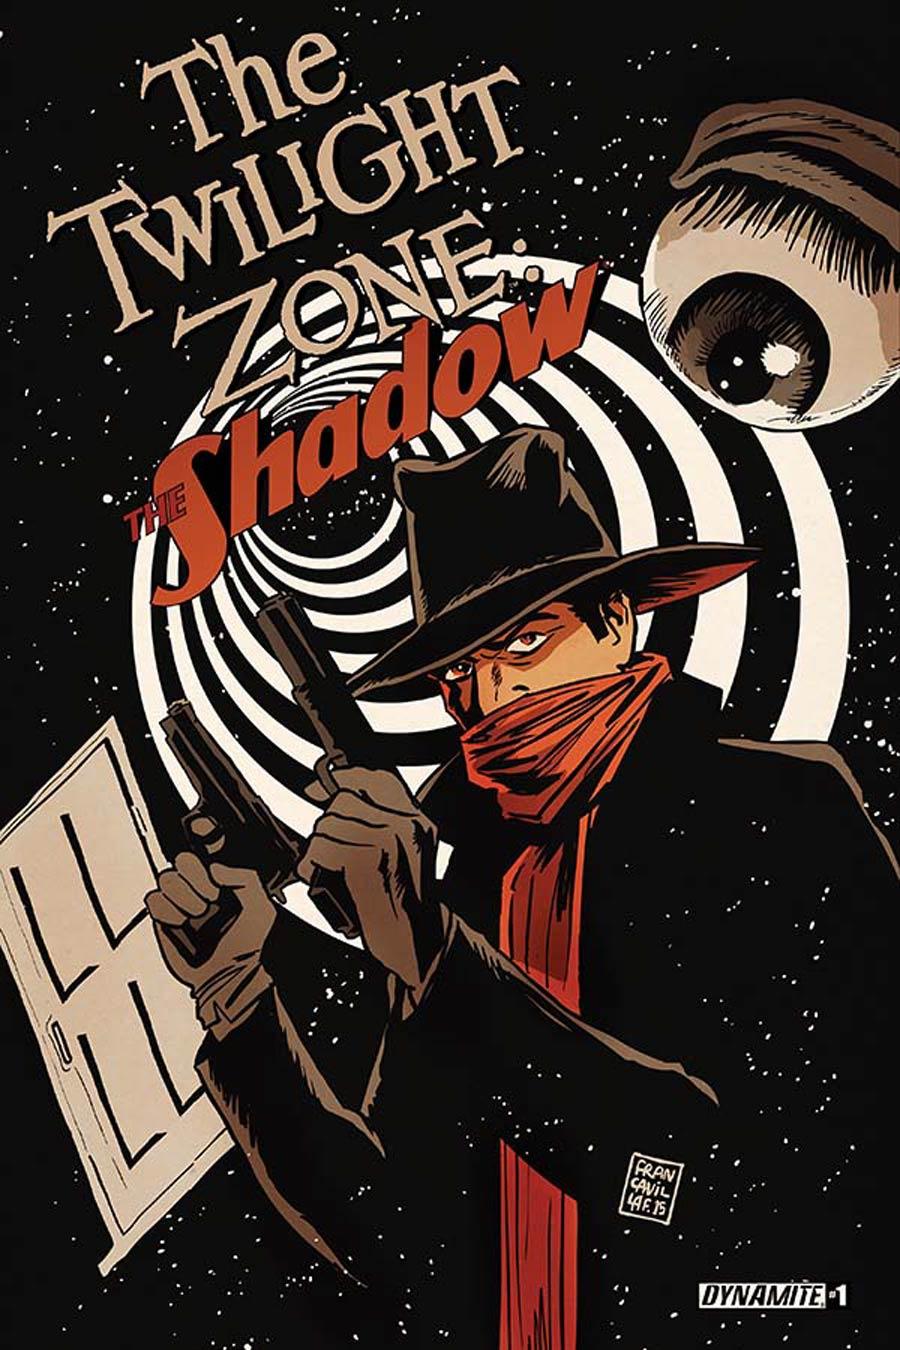 Twilight Zone Shadow #1 Cover A Regular Francesco Francavilla Cover